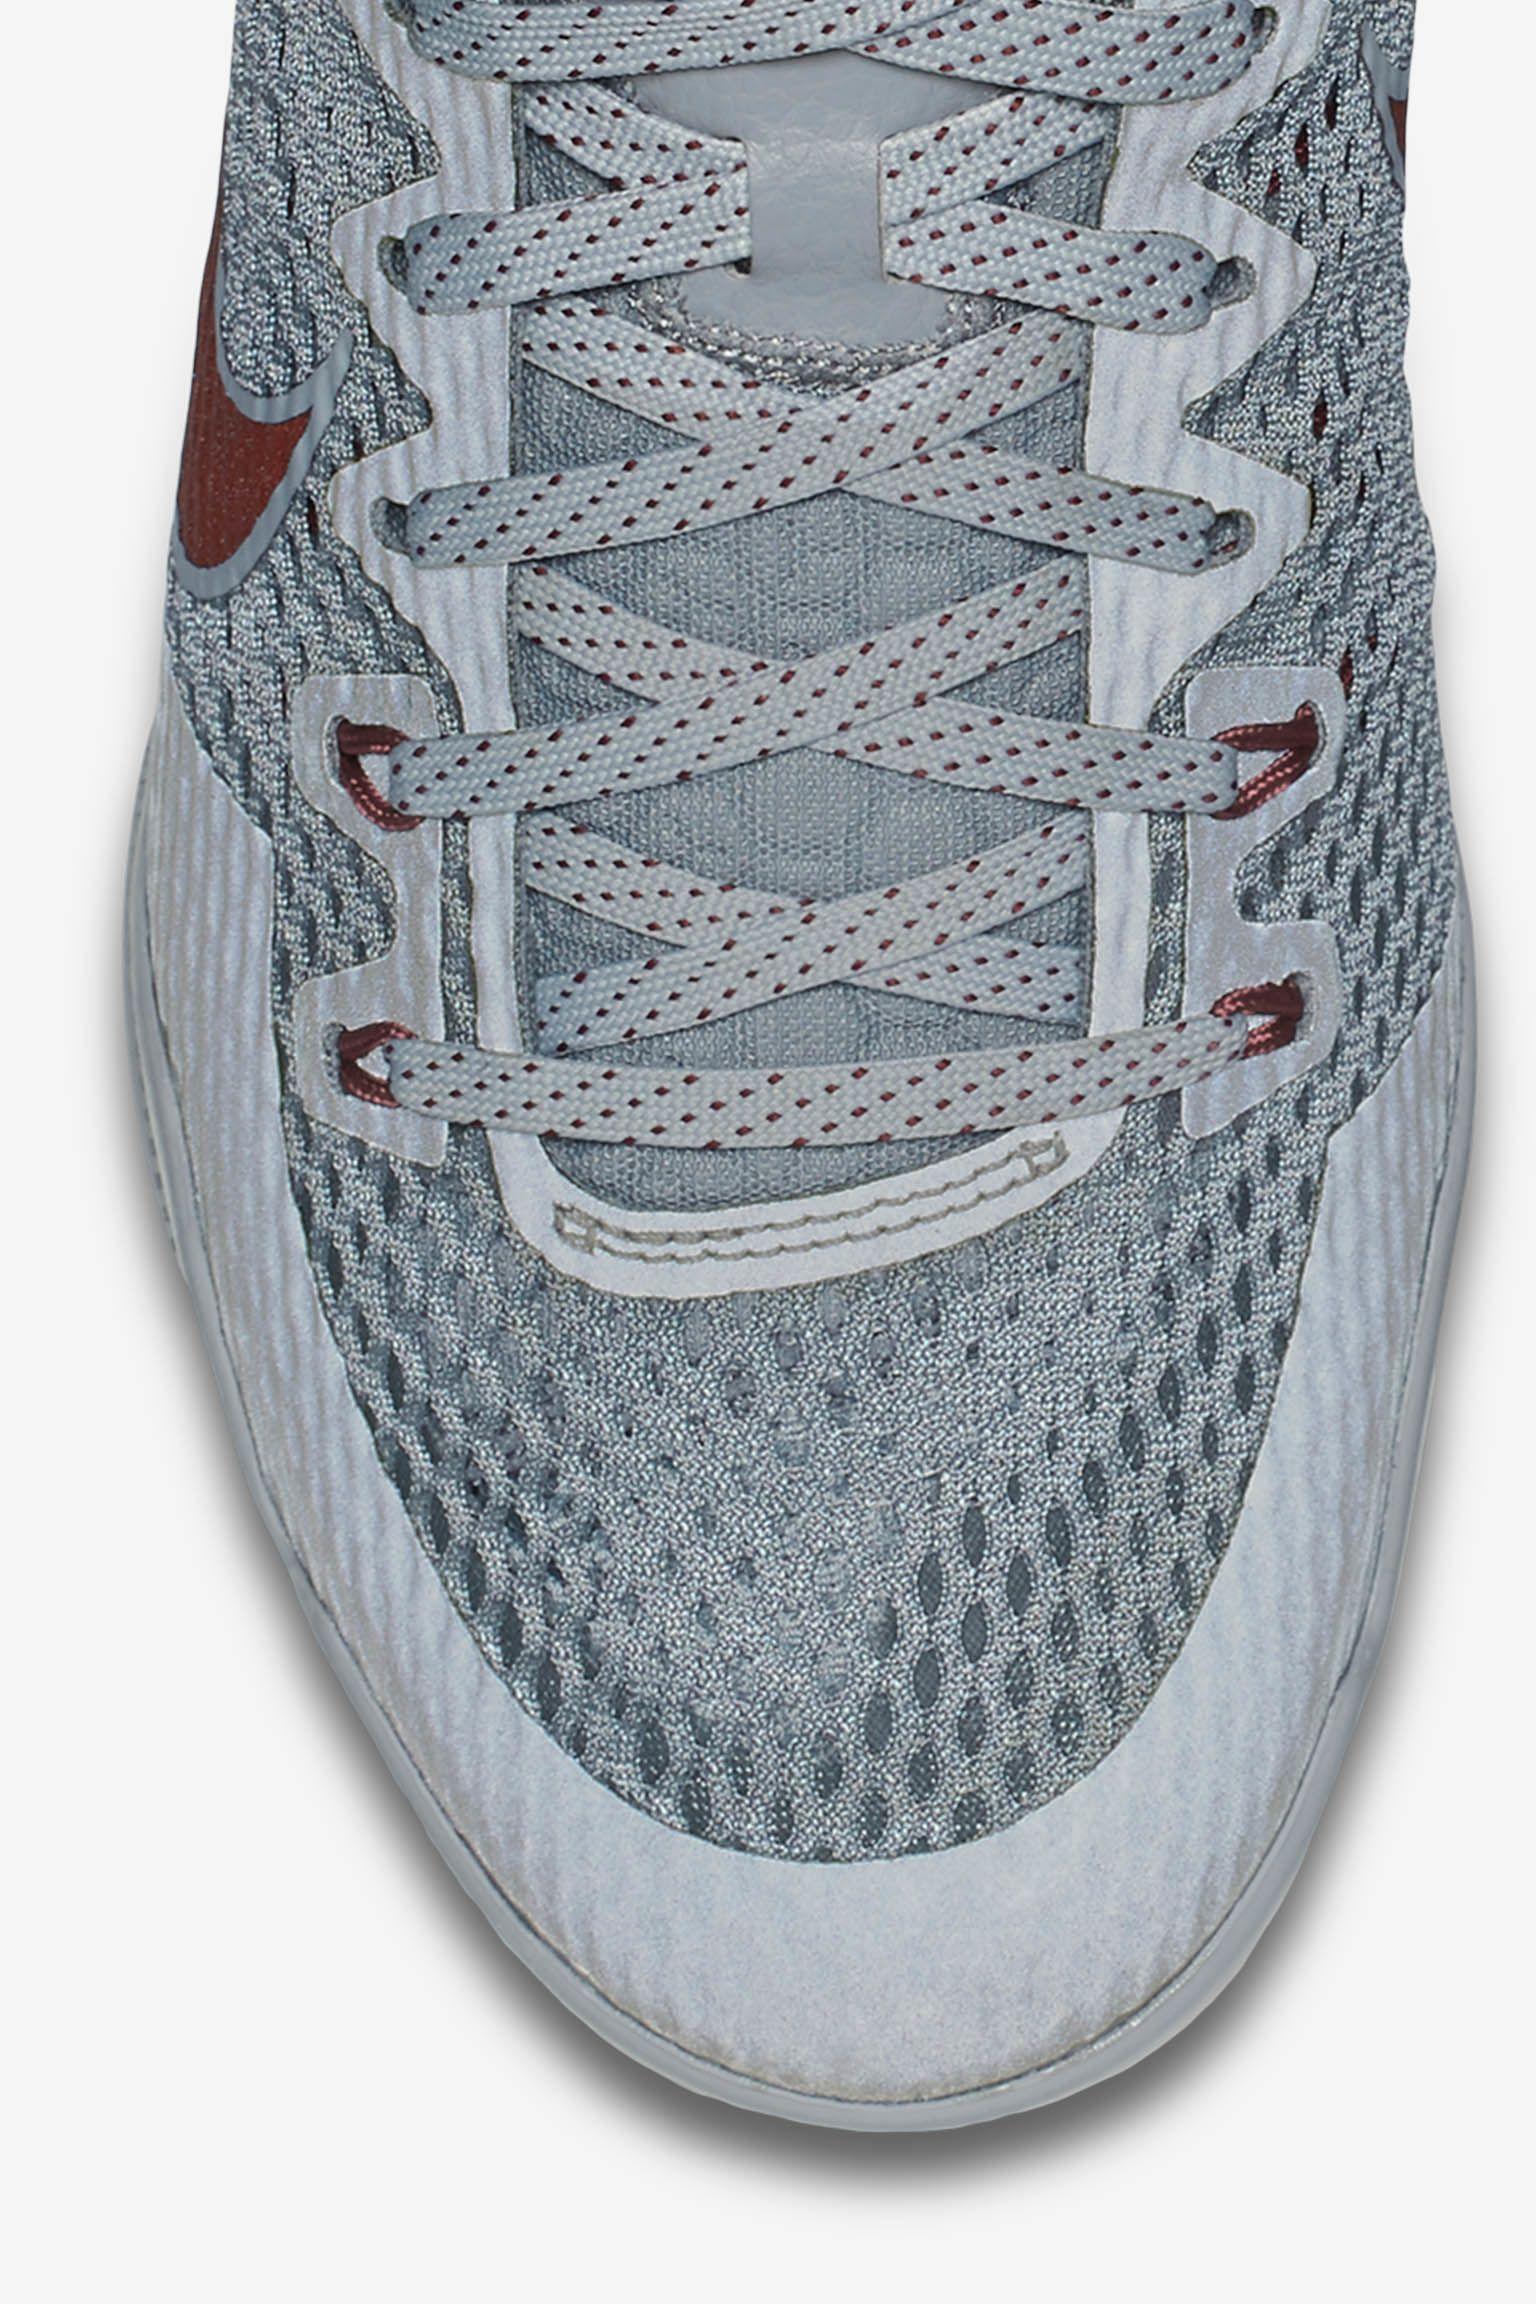 Nike Kobe 11 'Aces' Release Date